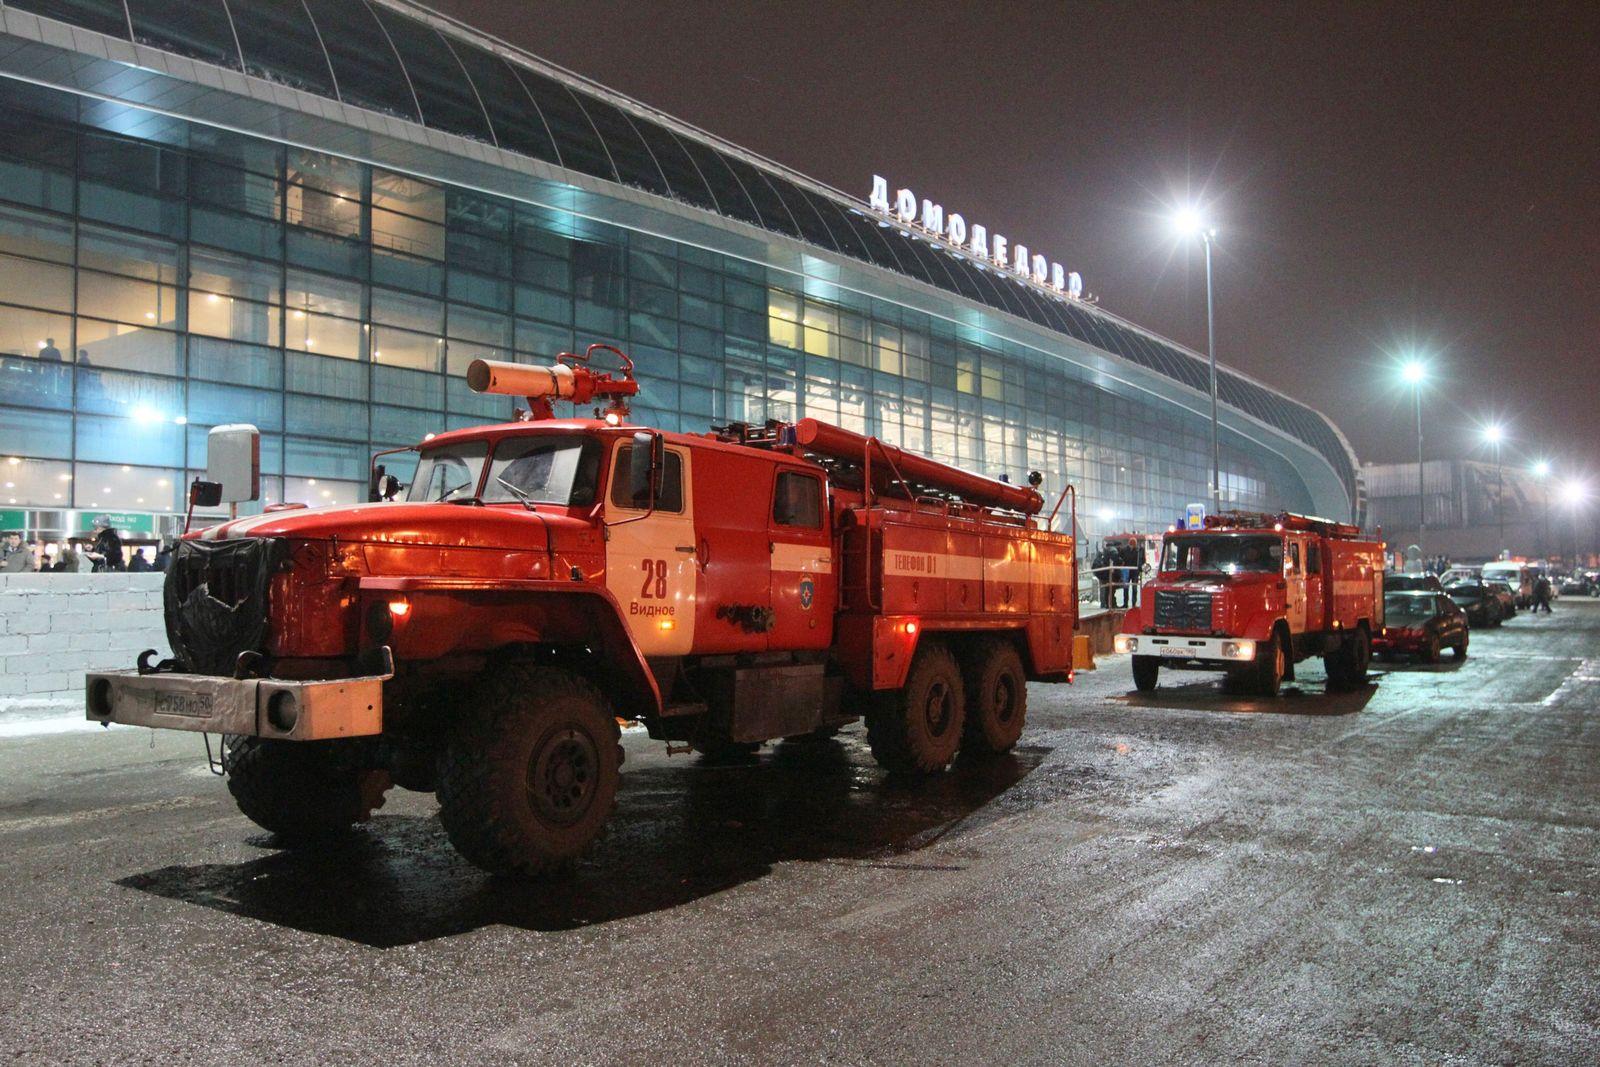 Moskau/ Anschlag/ Domodedowo Flughafen VID